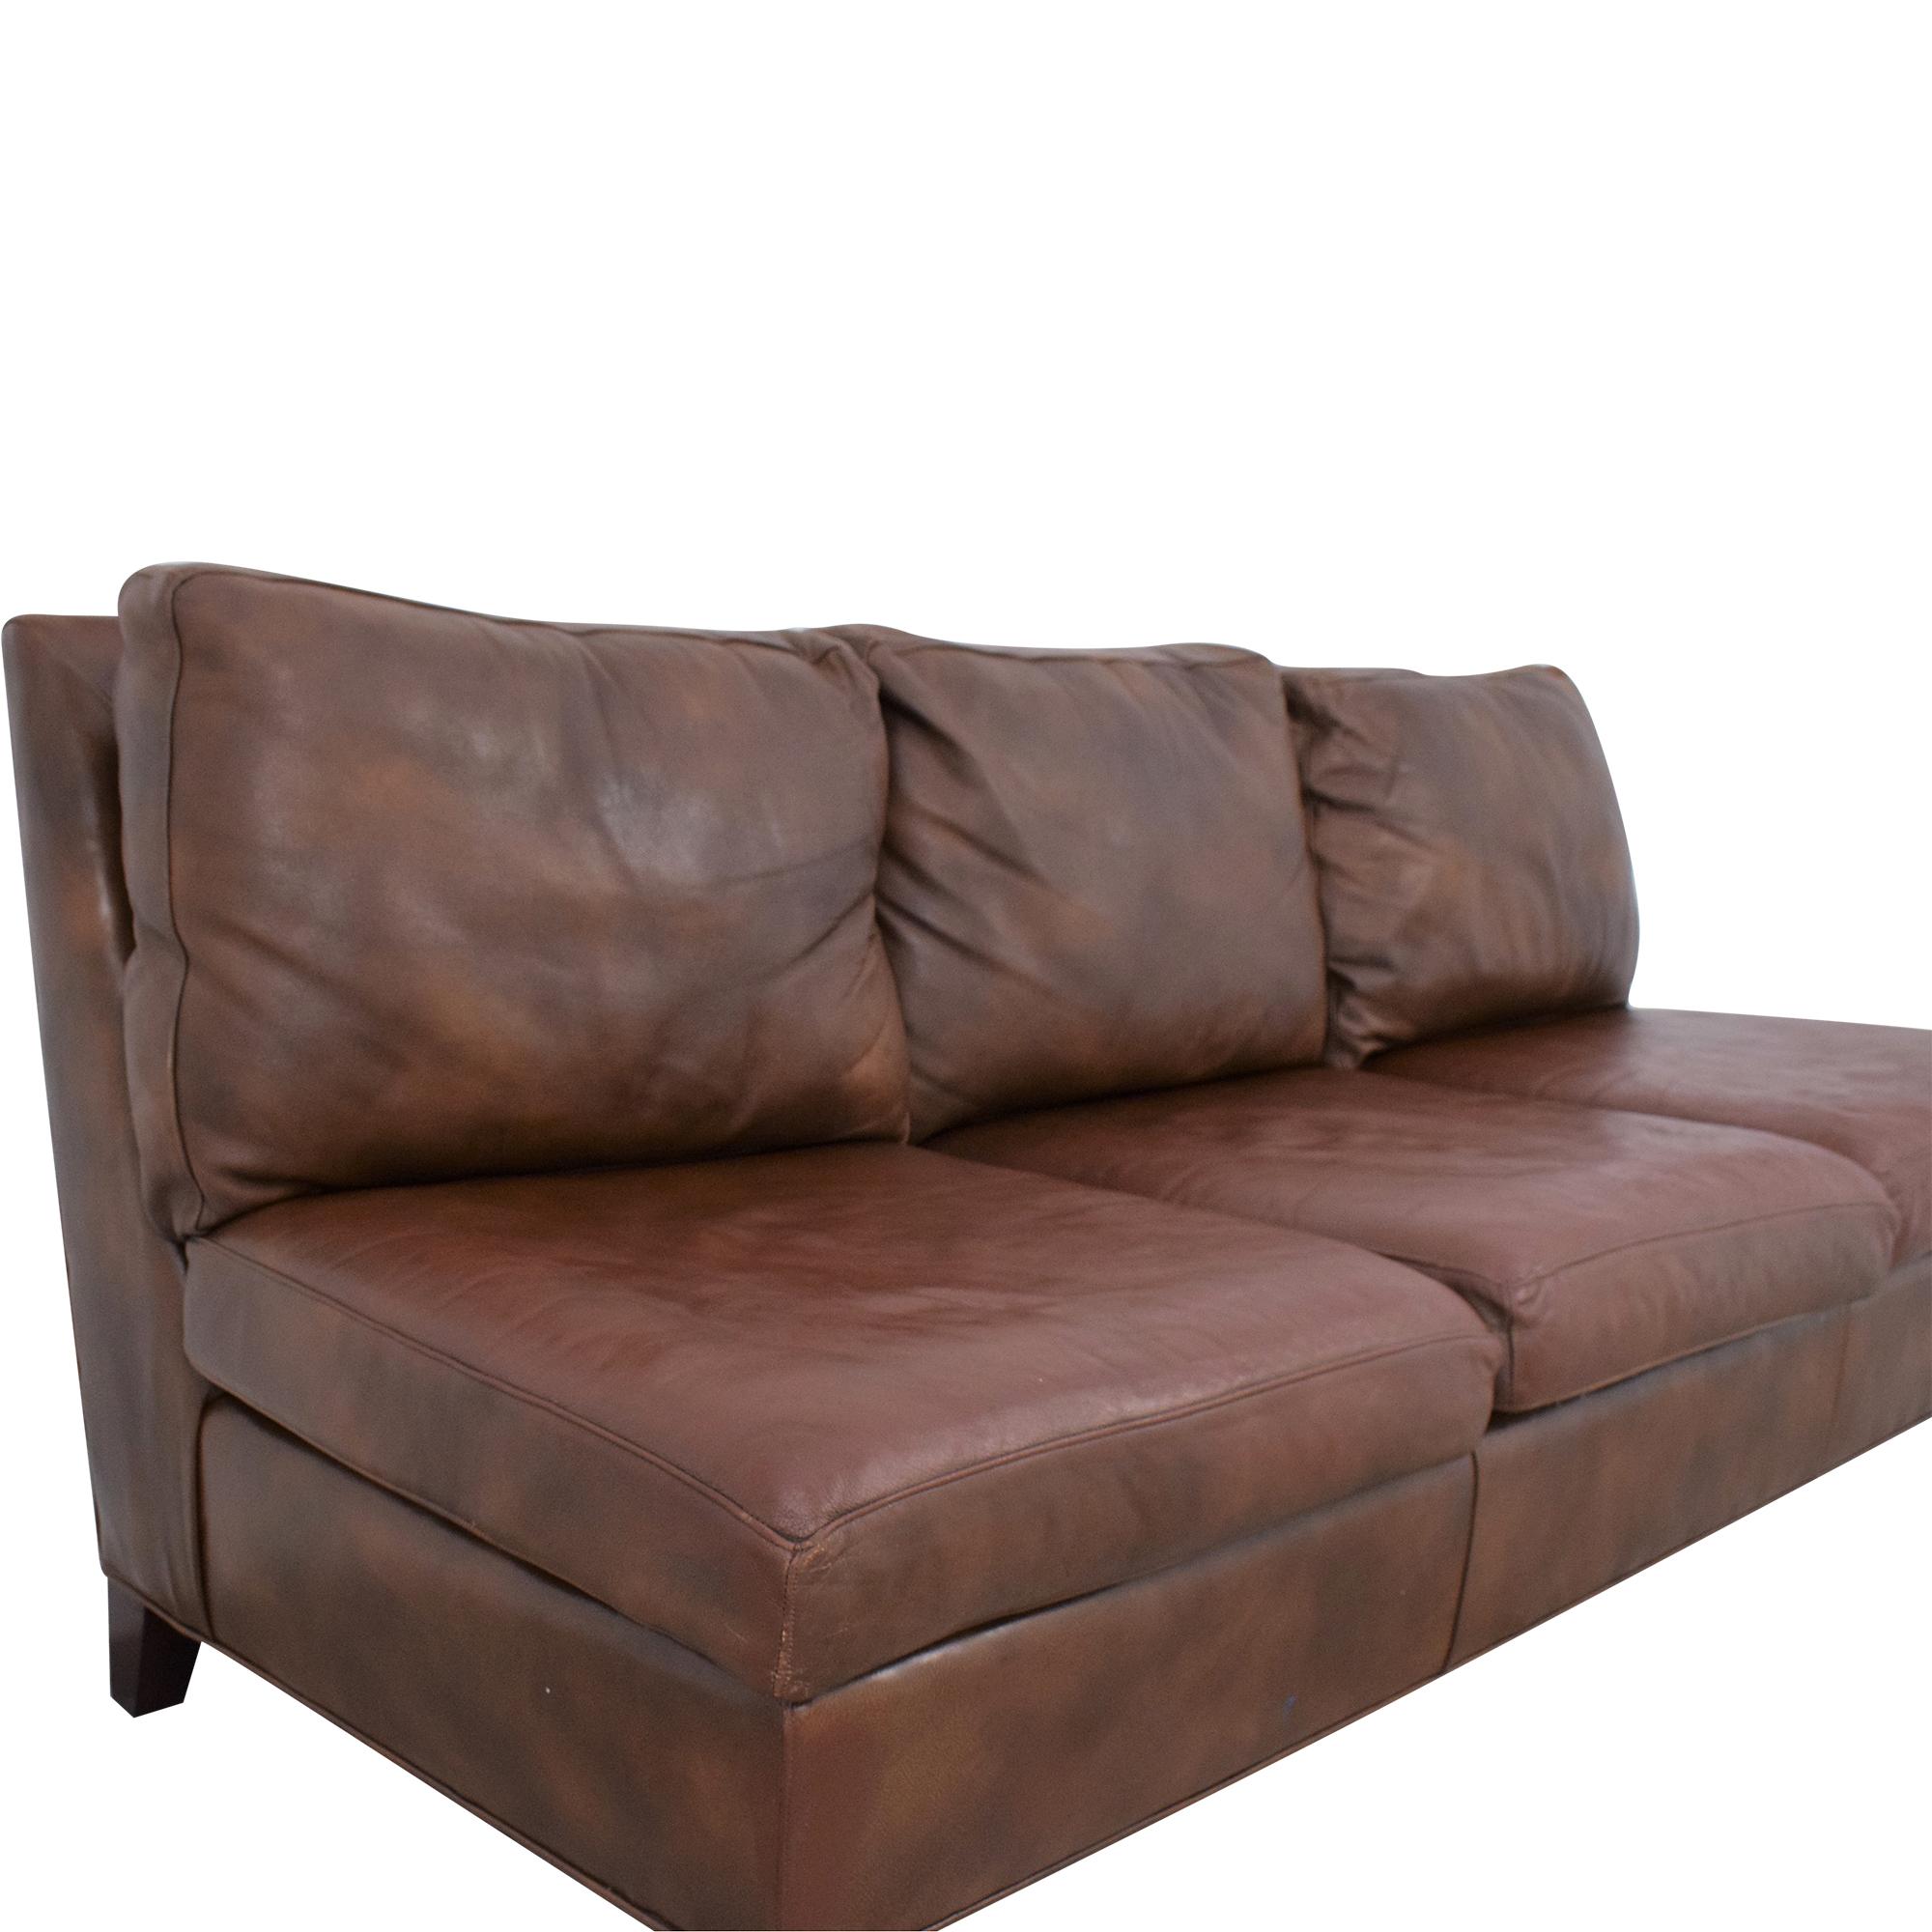 buy McKinley Leather Furniture Armless Sofa McKinley Leather Furniture